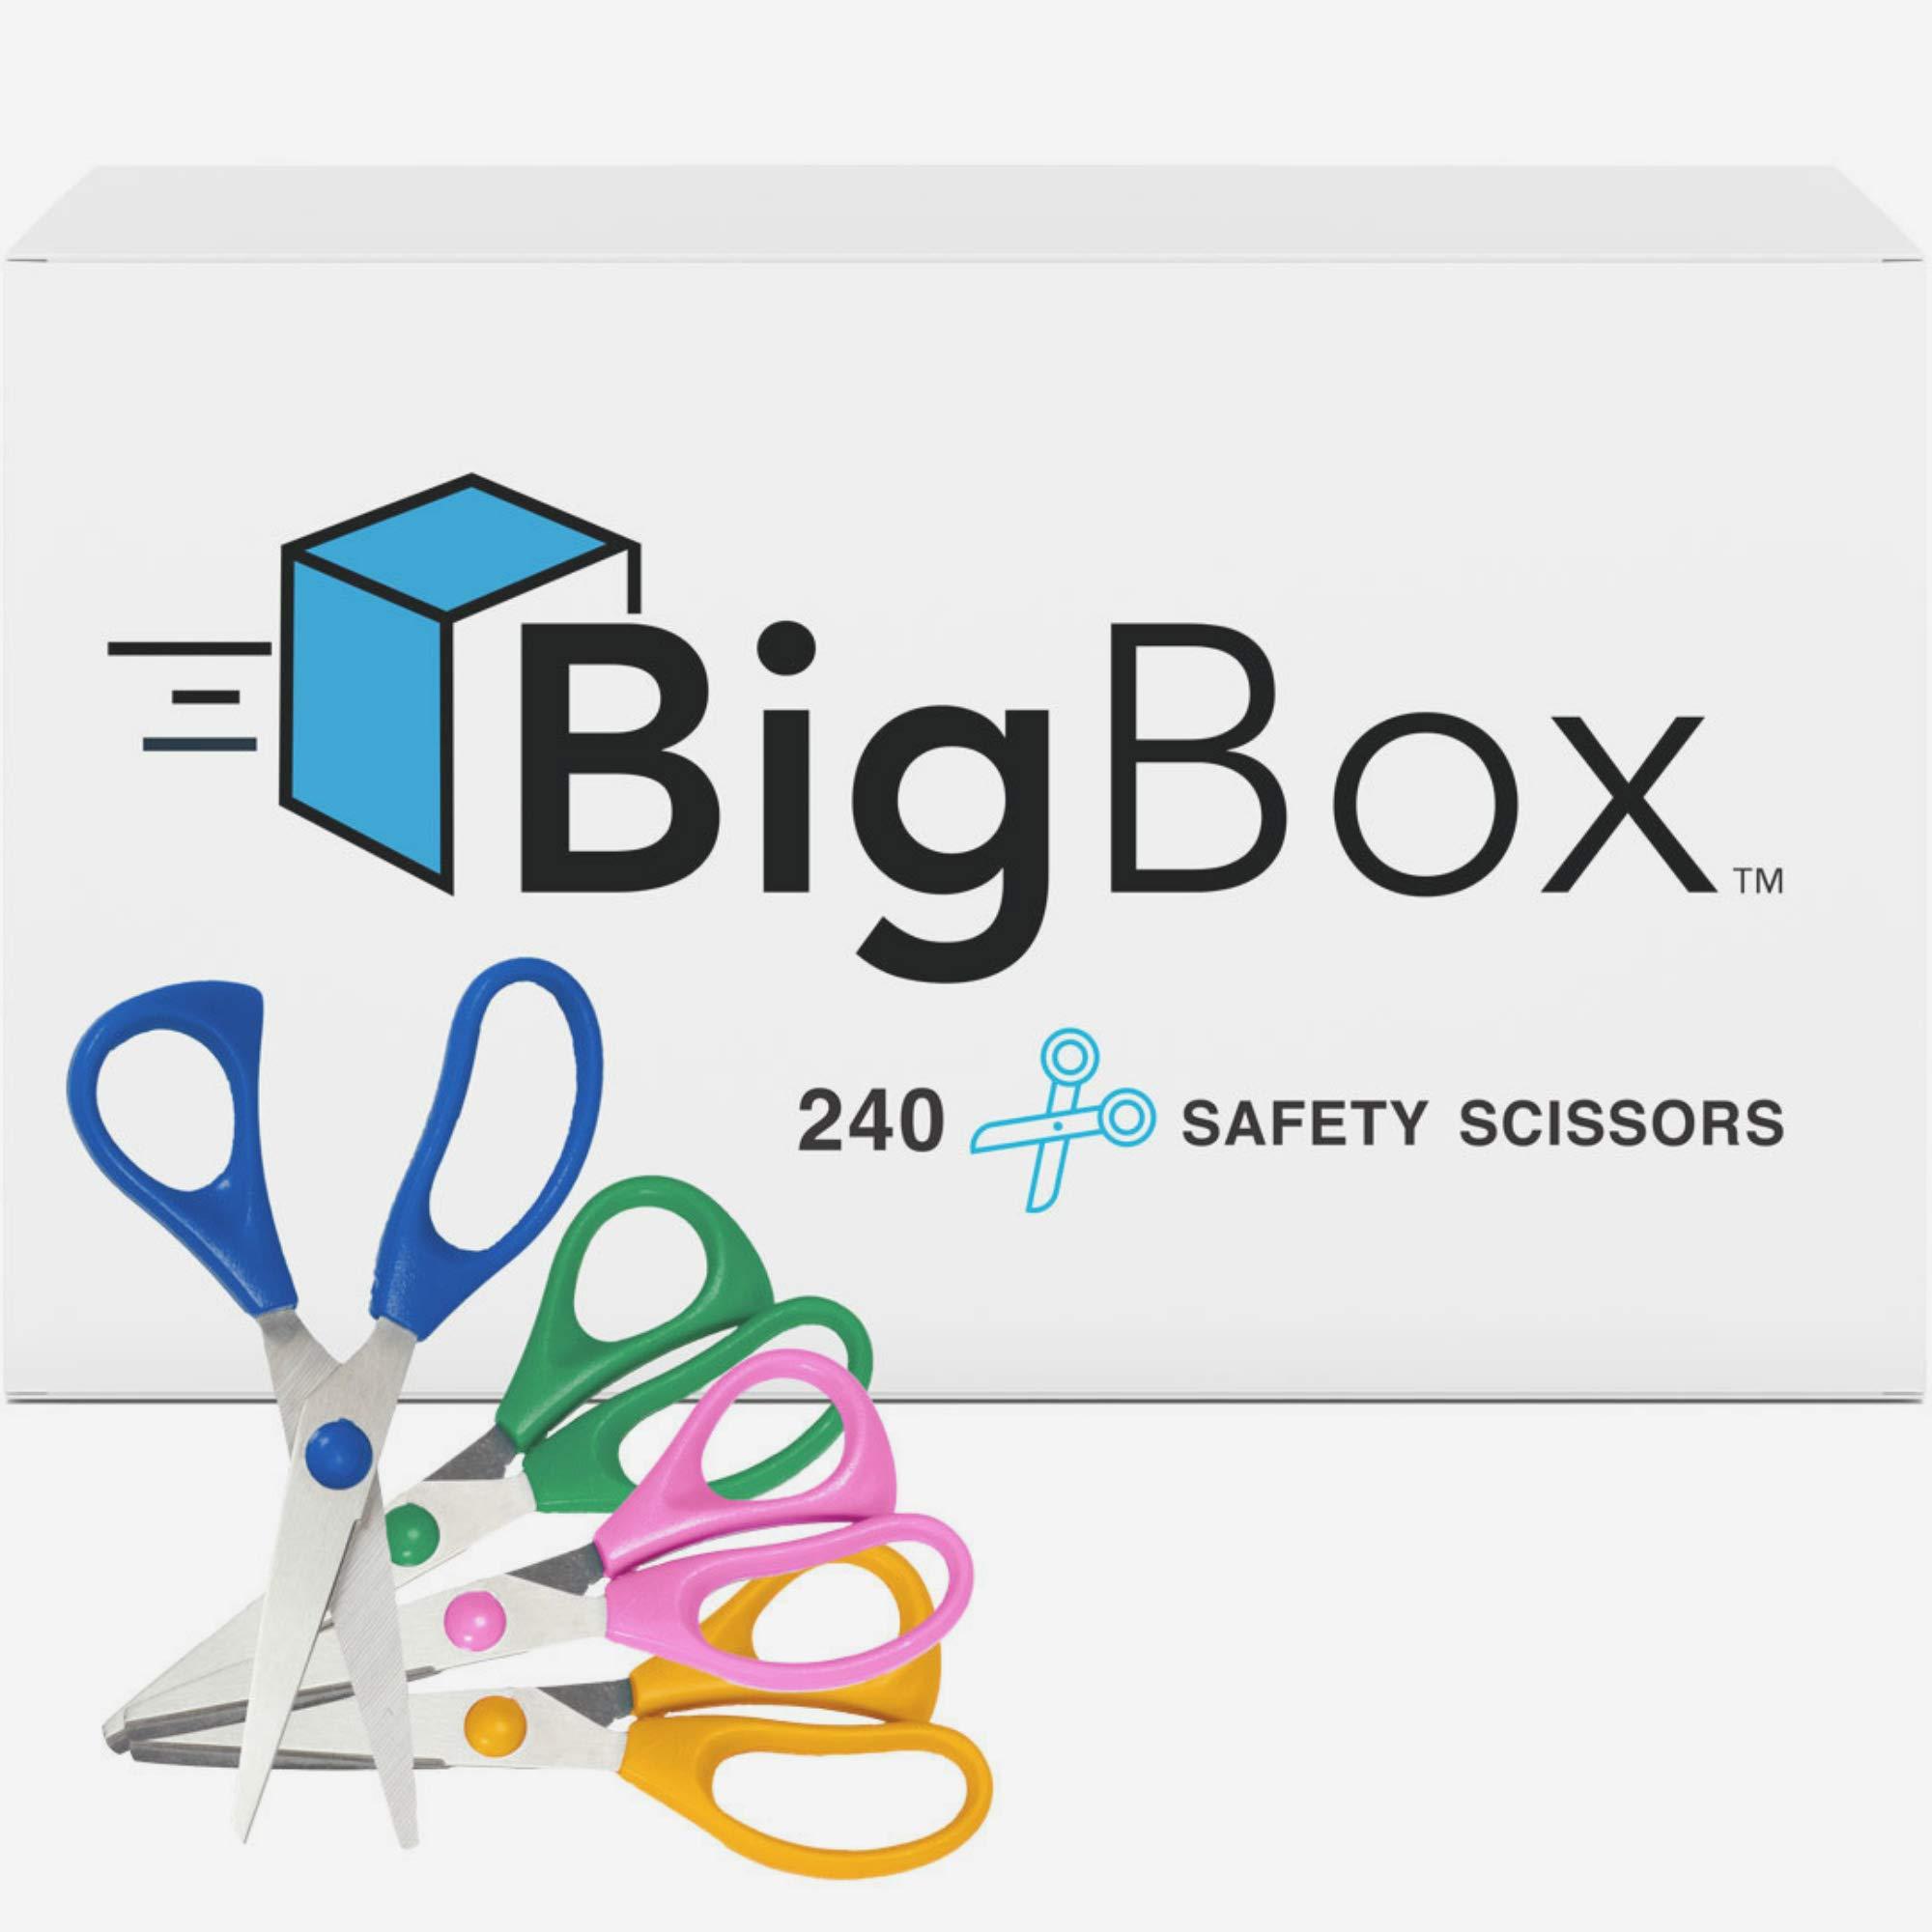 Big Box 5'' Safety Scissors (Case of 240)